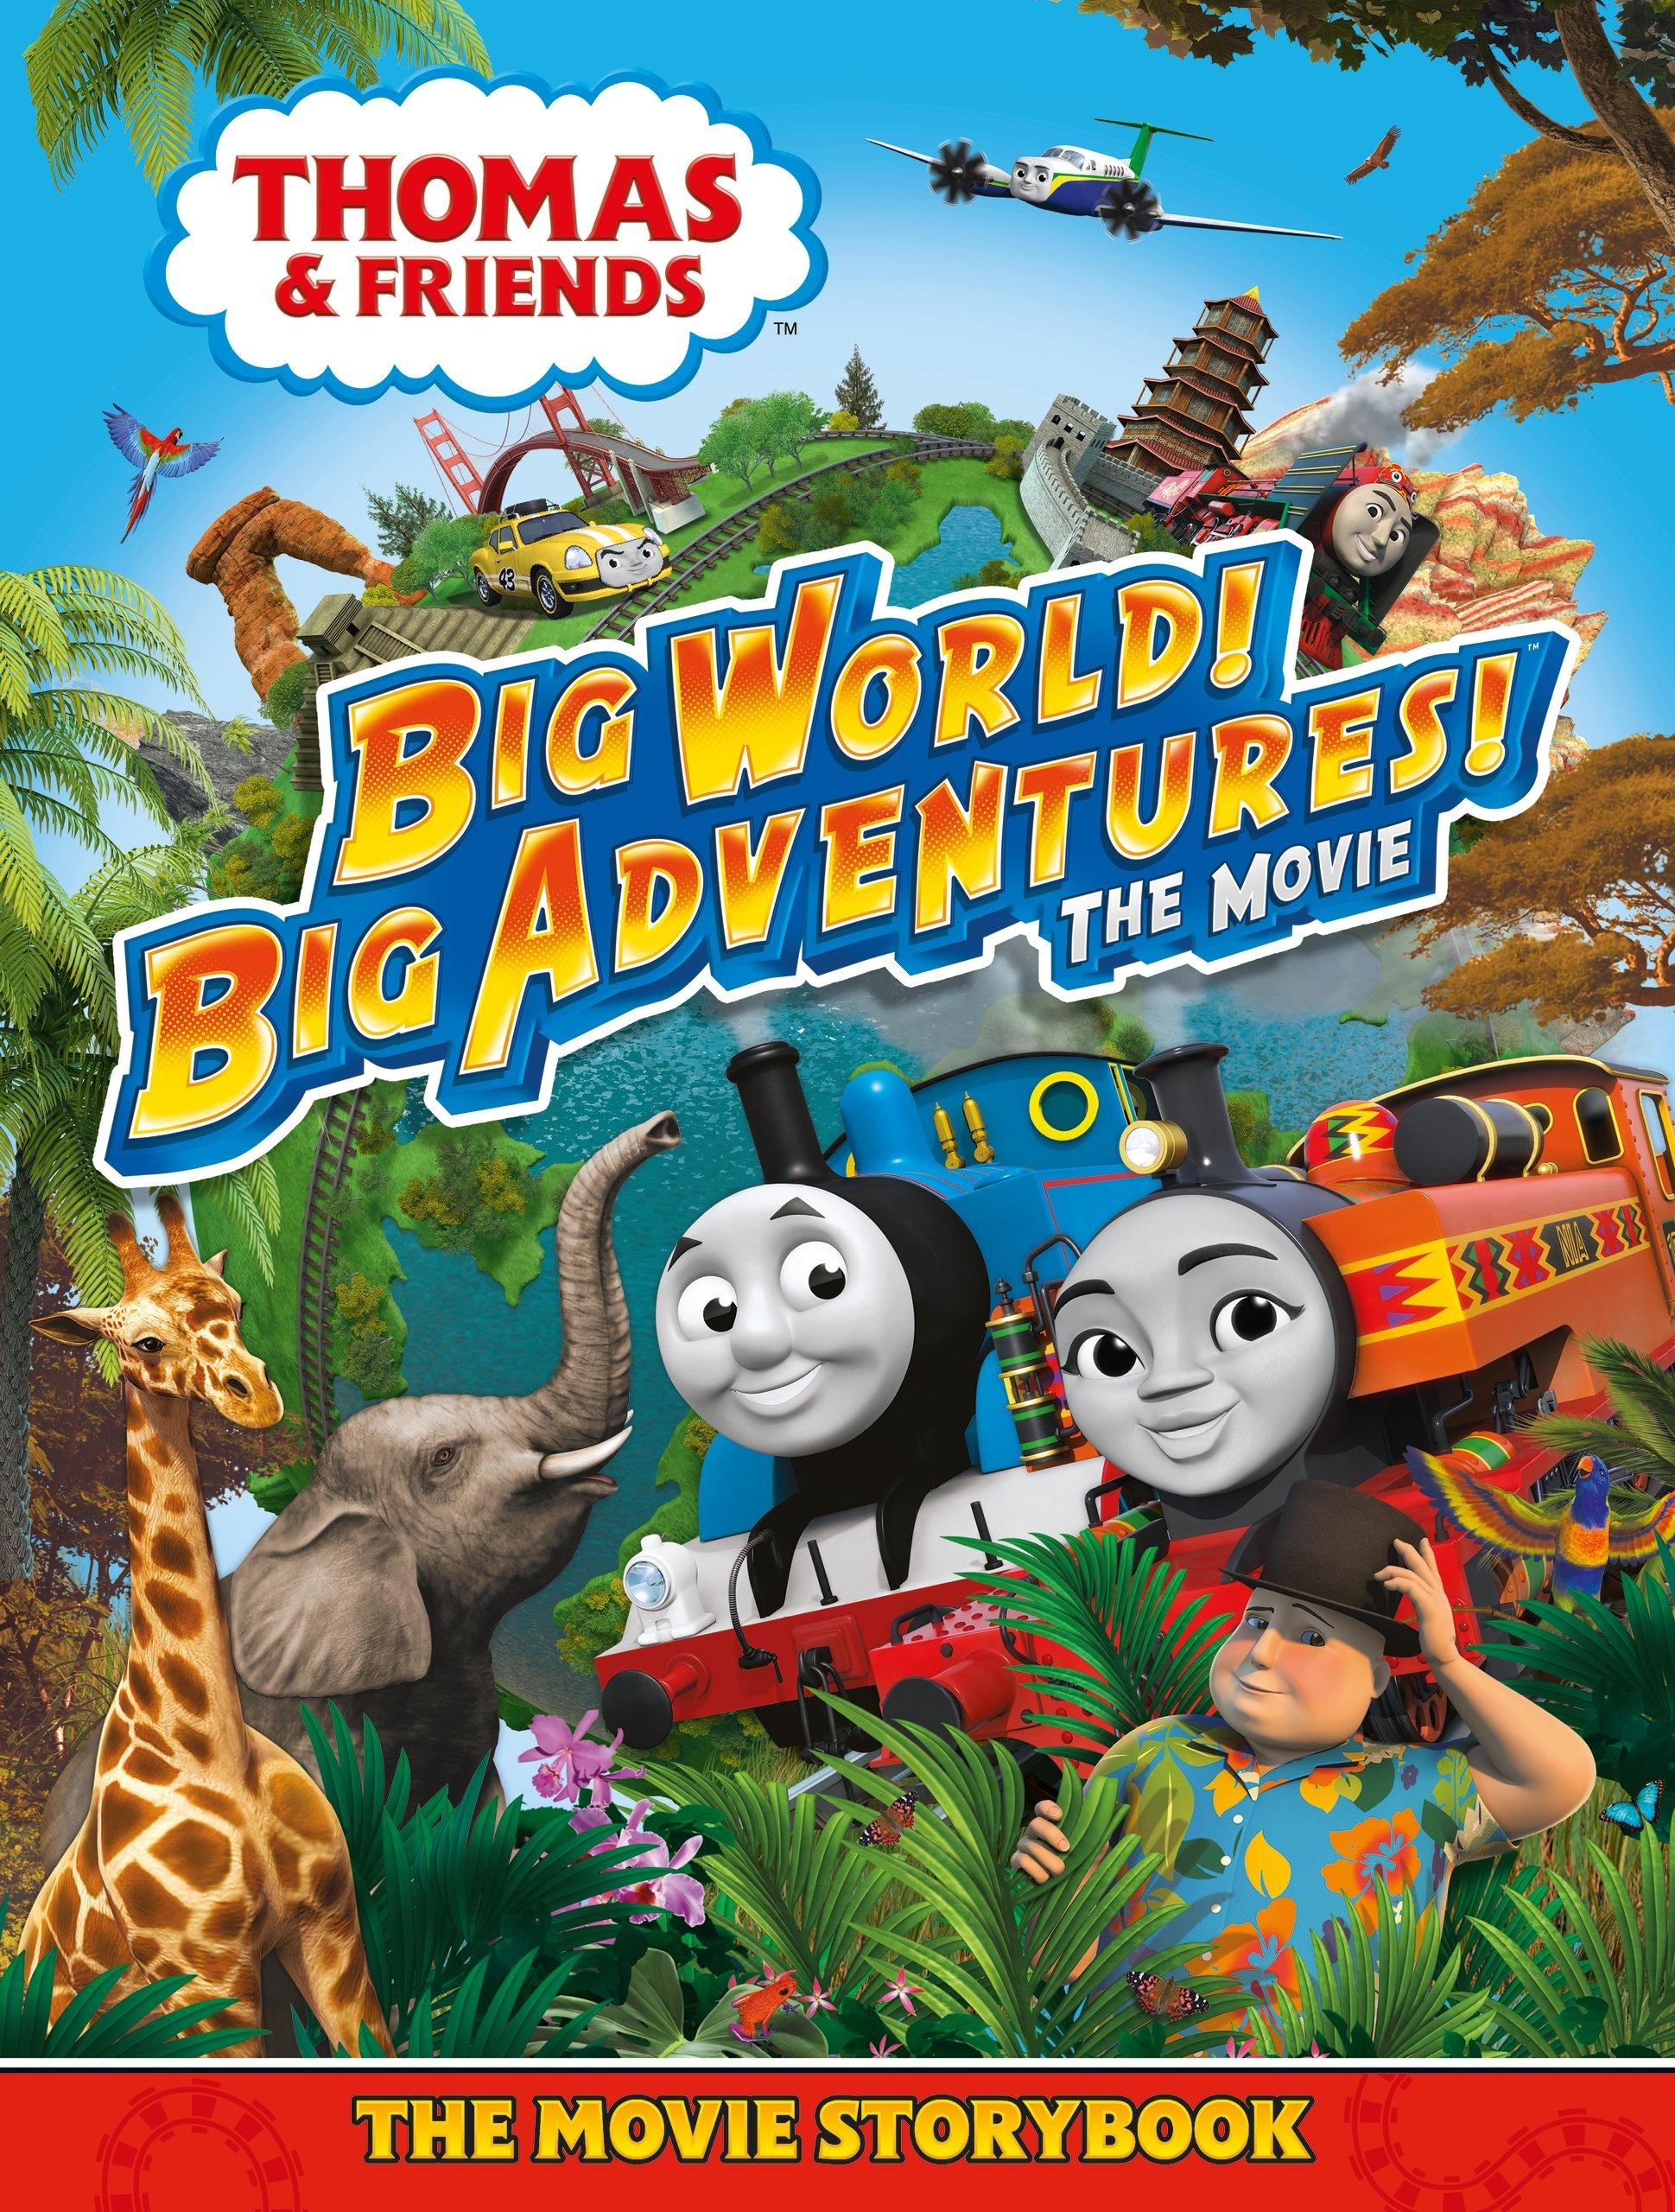 Big World! Big Adventures! The Movie Storybook